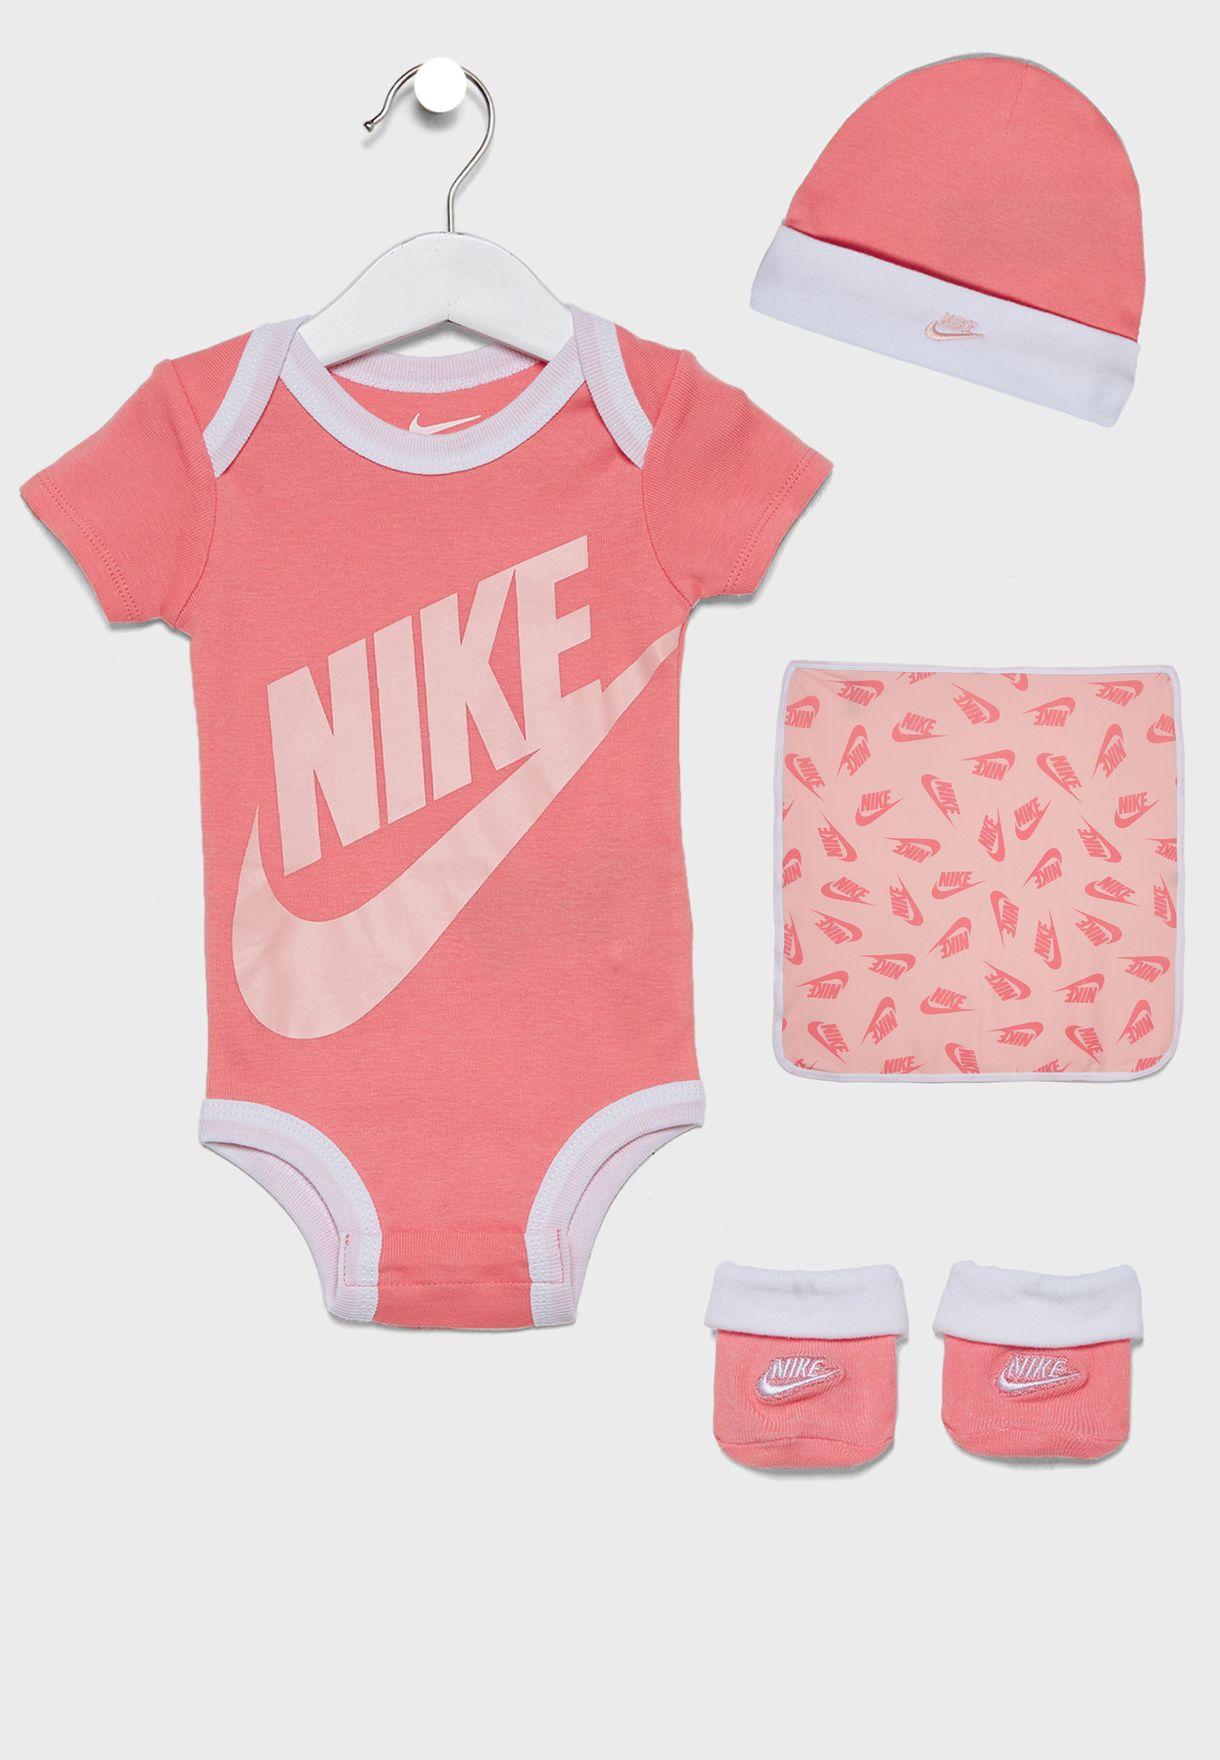 Infant Future Bodysuit + Blanket